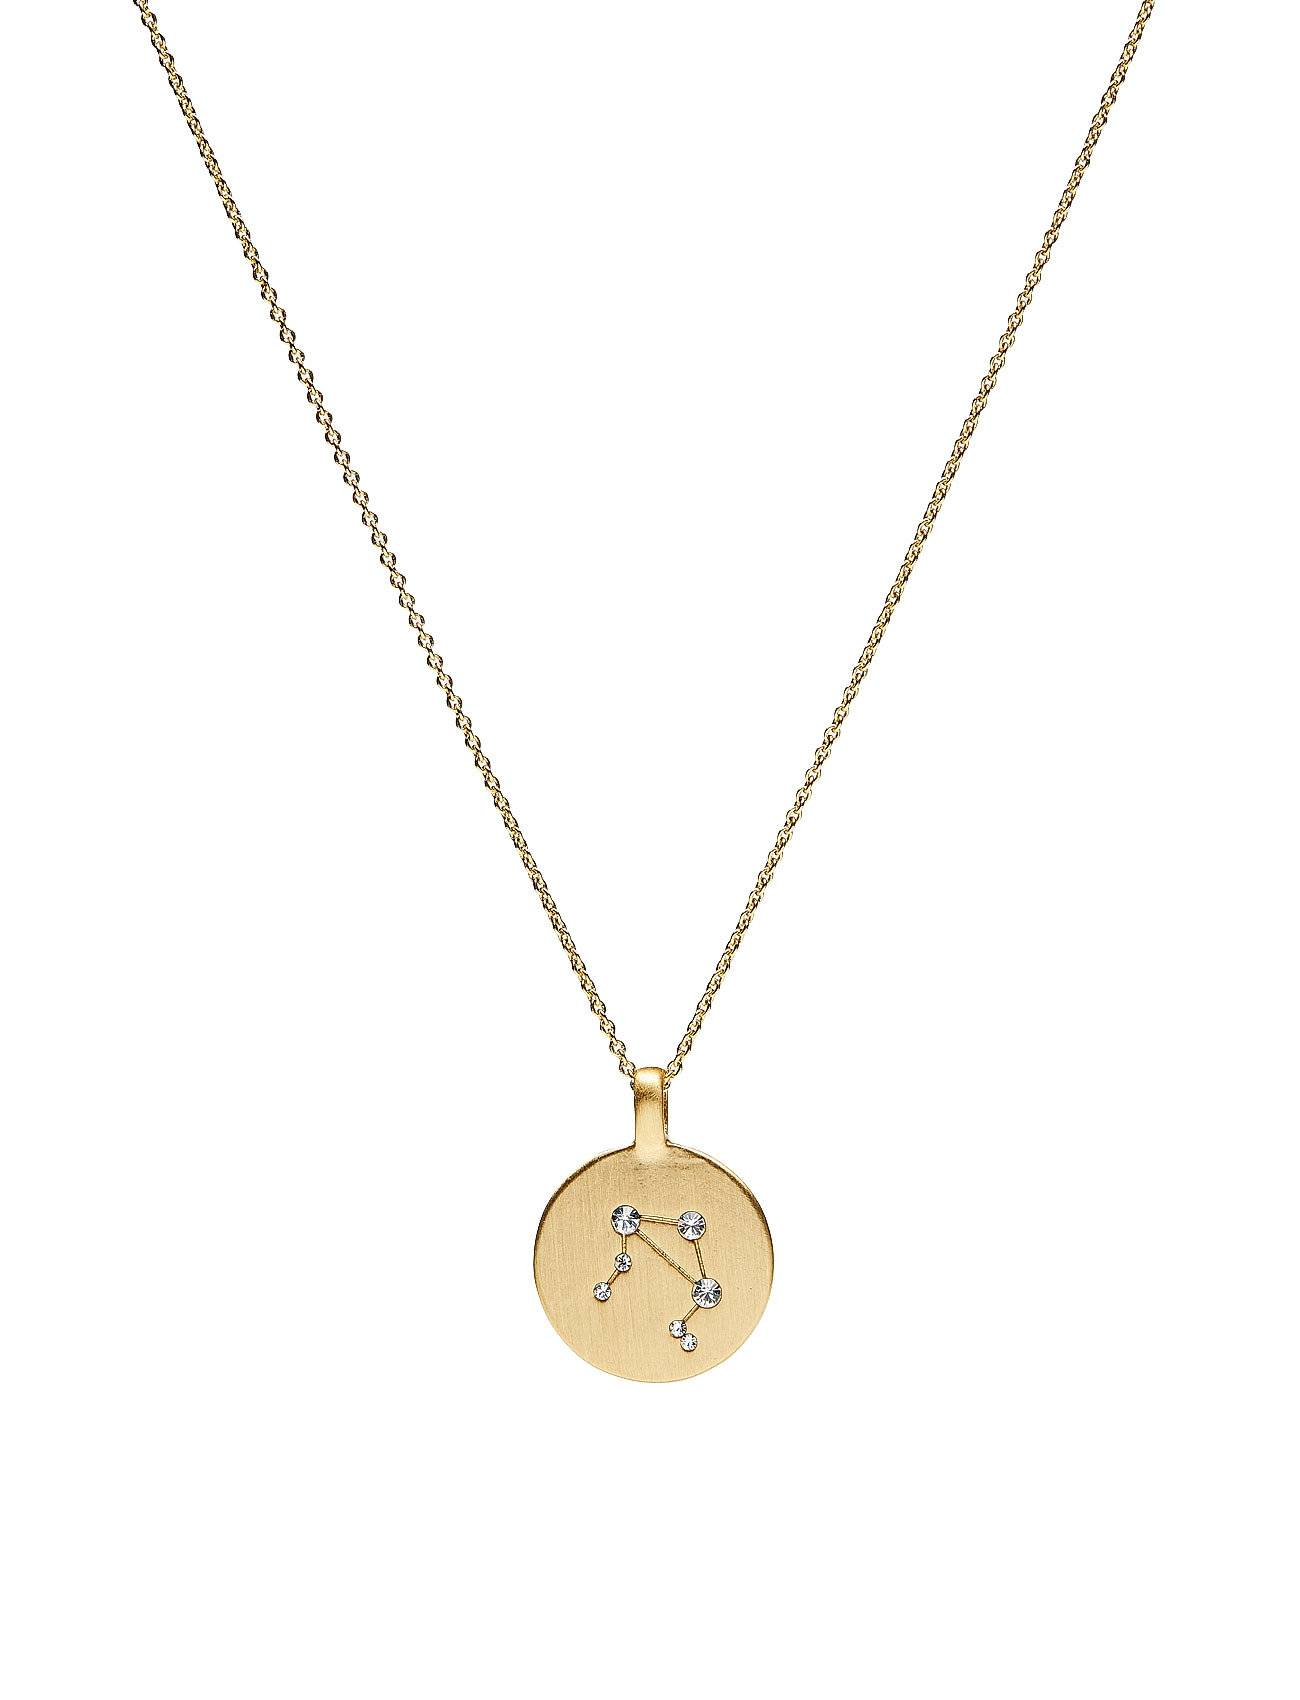 Pilgrim Necklace - Libra Accessories Jewellery Necklaces Dainty Necklaces Kulta Pilgrim